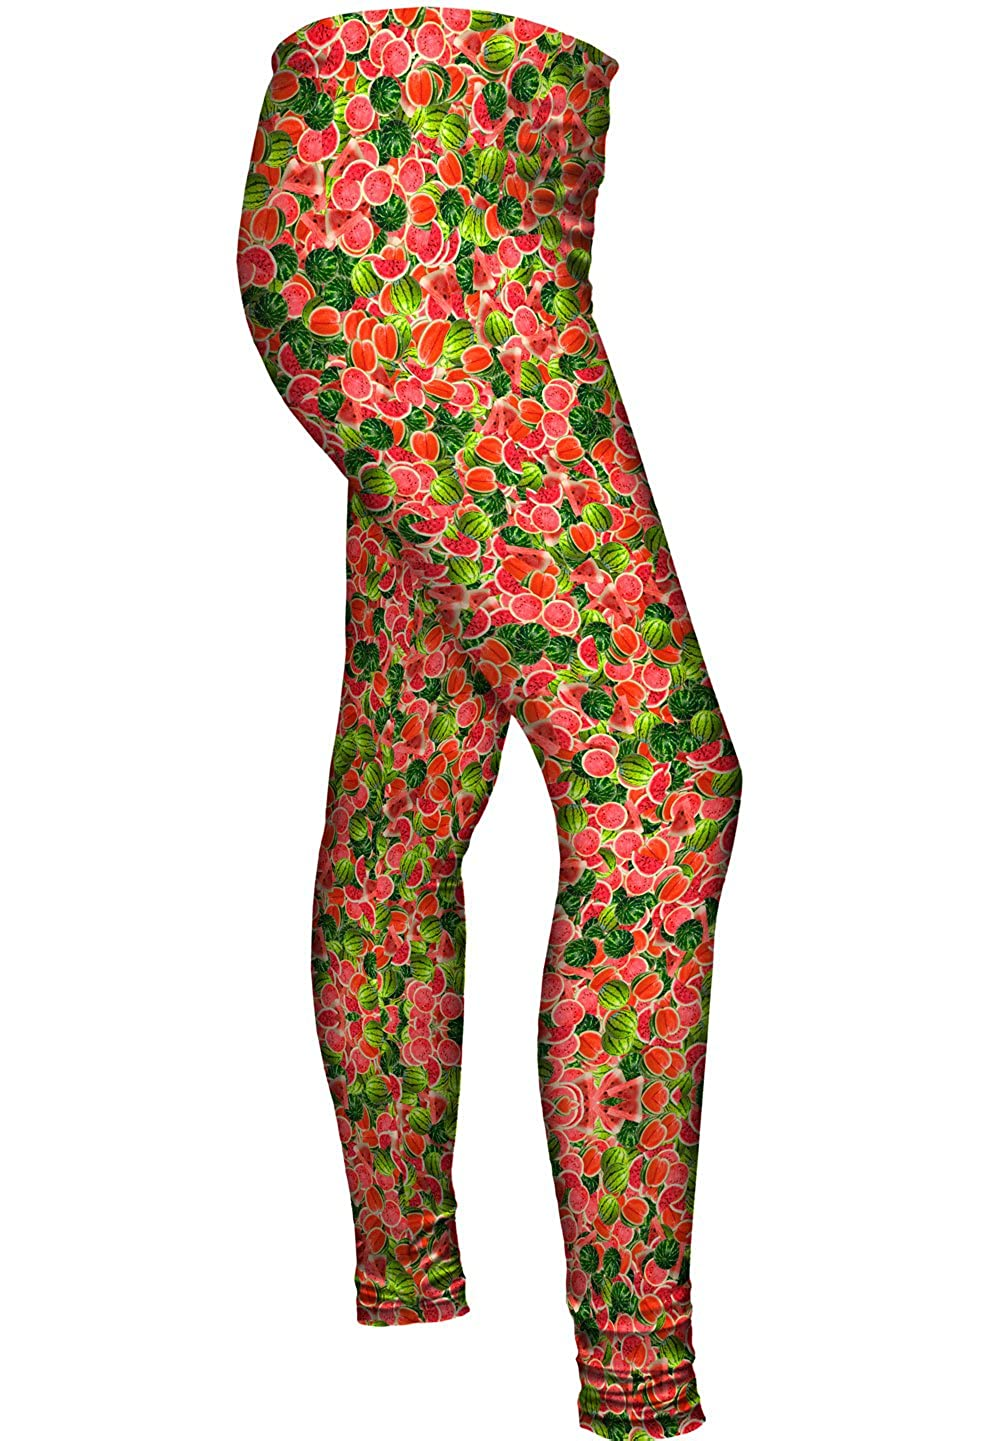 Watermelon Summer Ladies Womens Leggings Yizzam